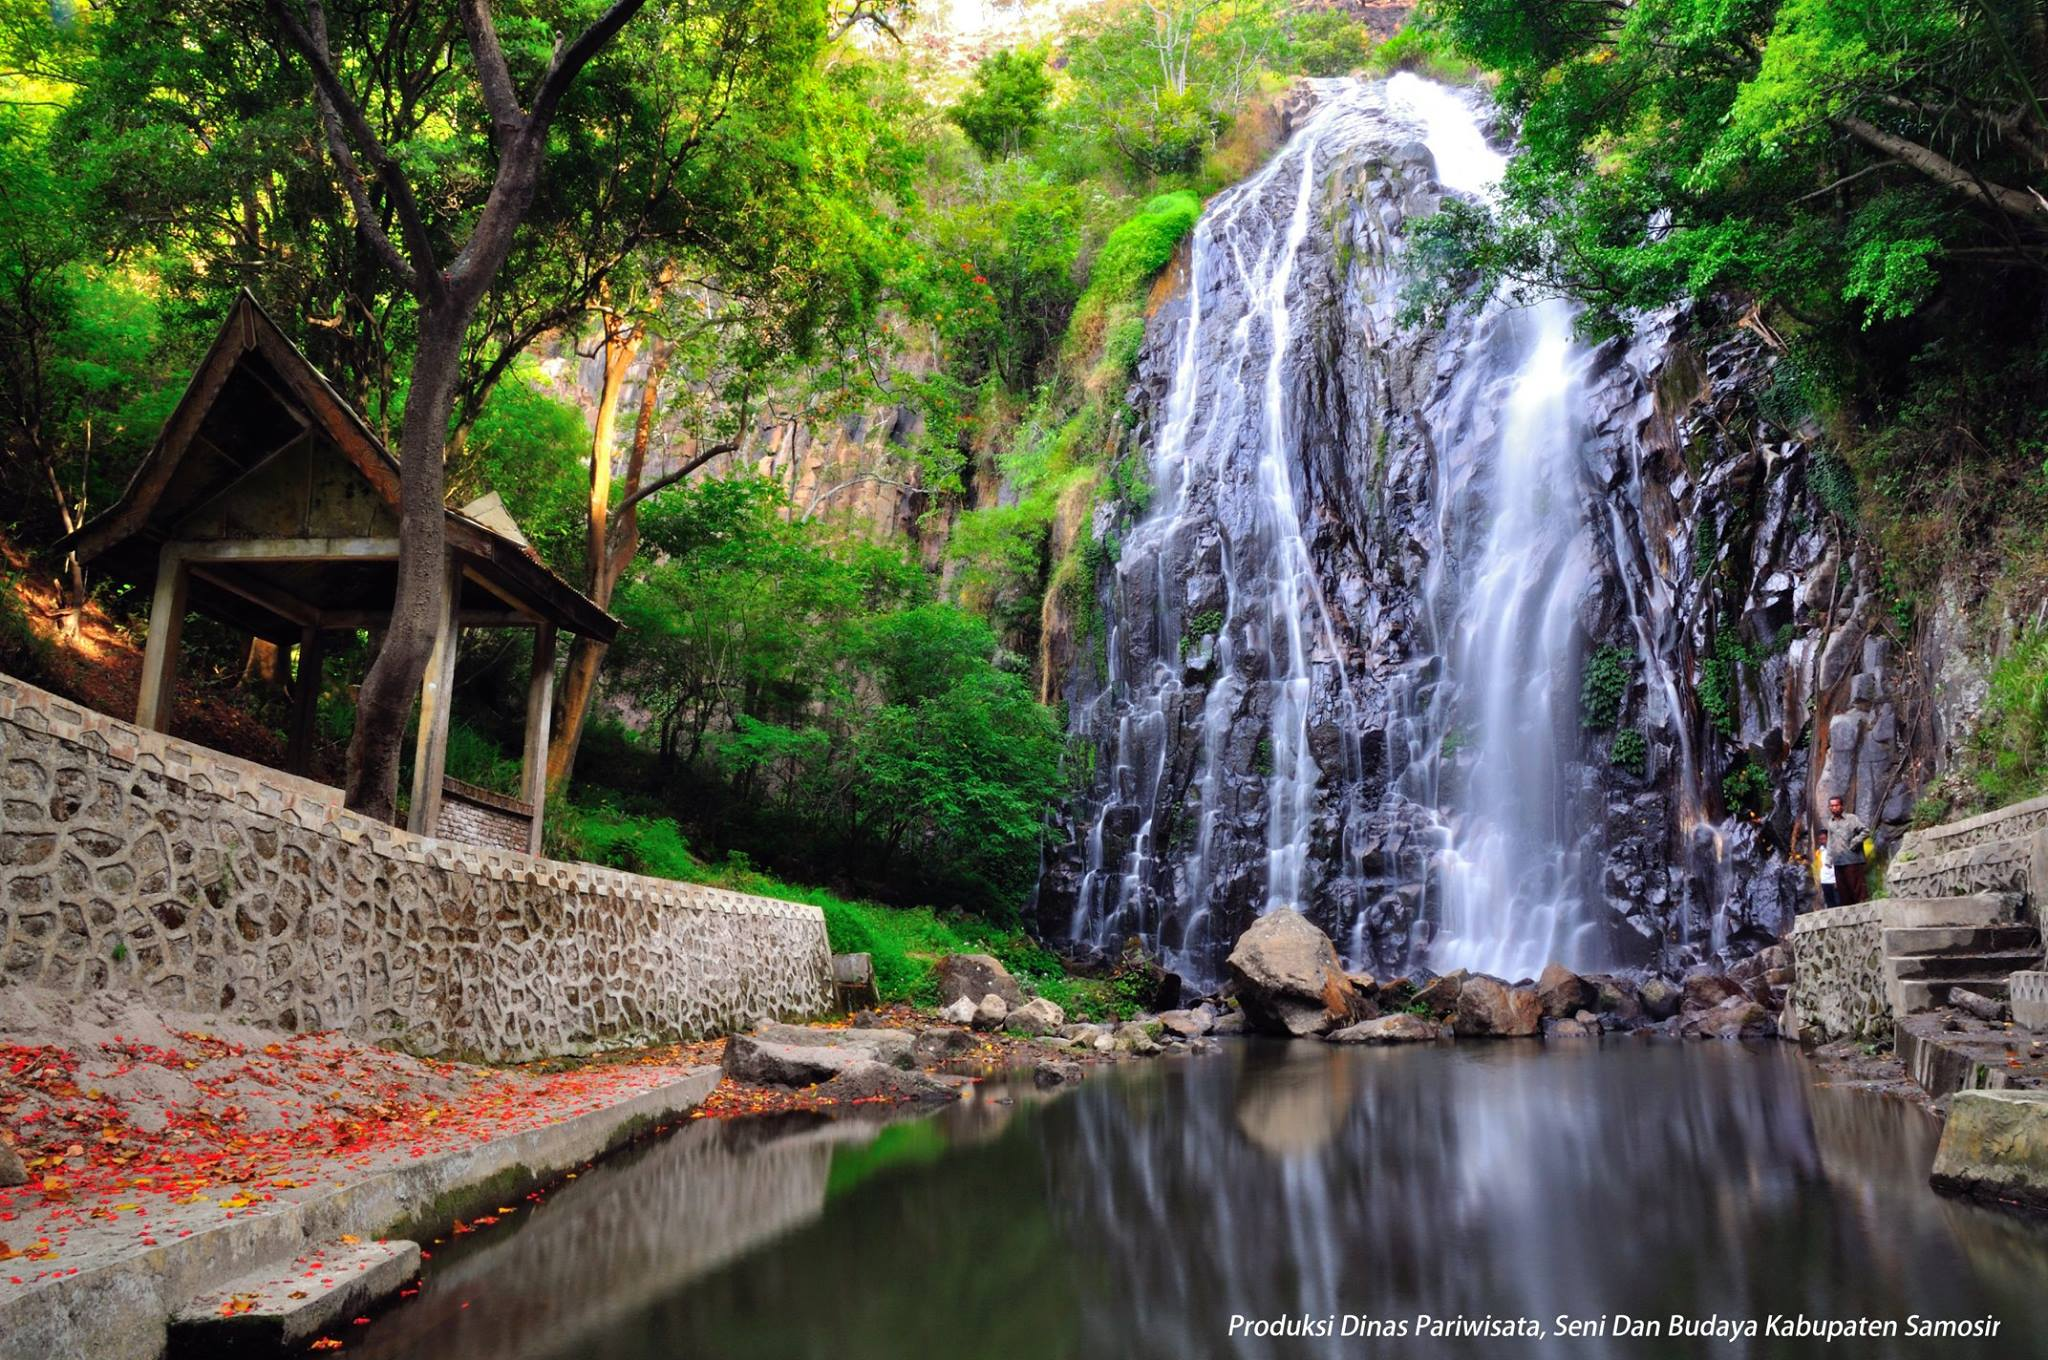 Indahnya Air Terjun Sampuran Efrata, Primadona Samosir